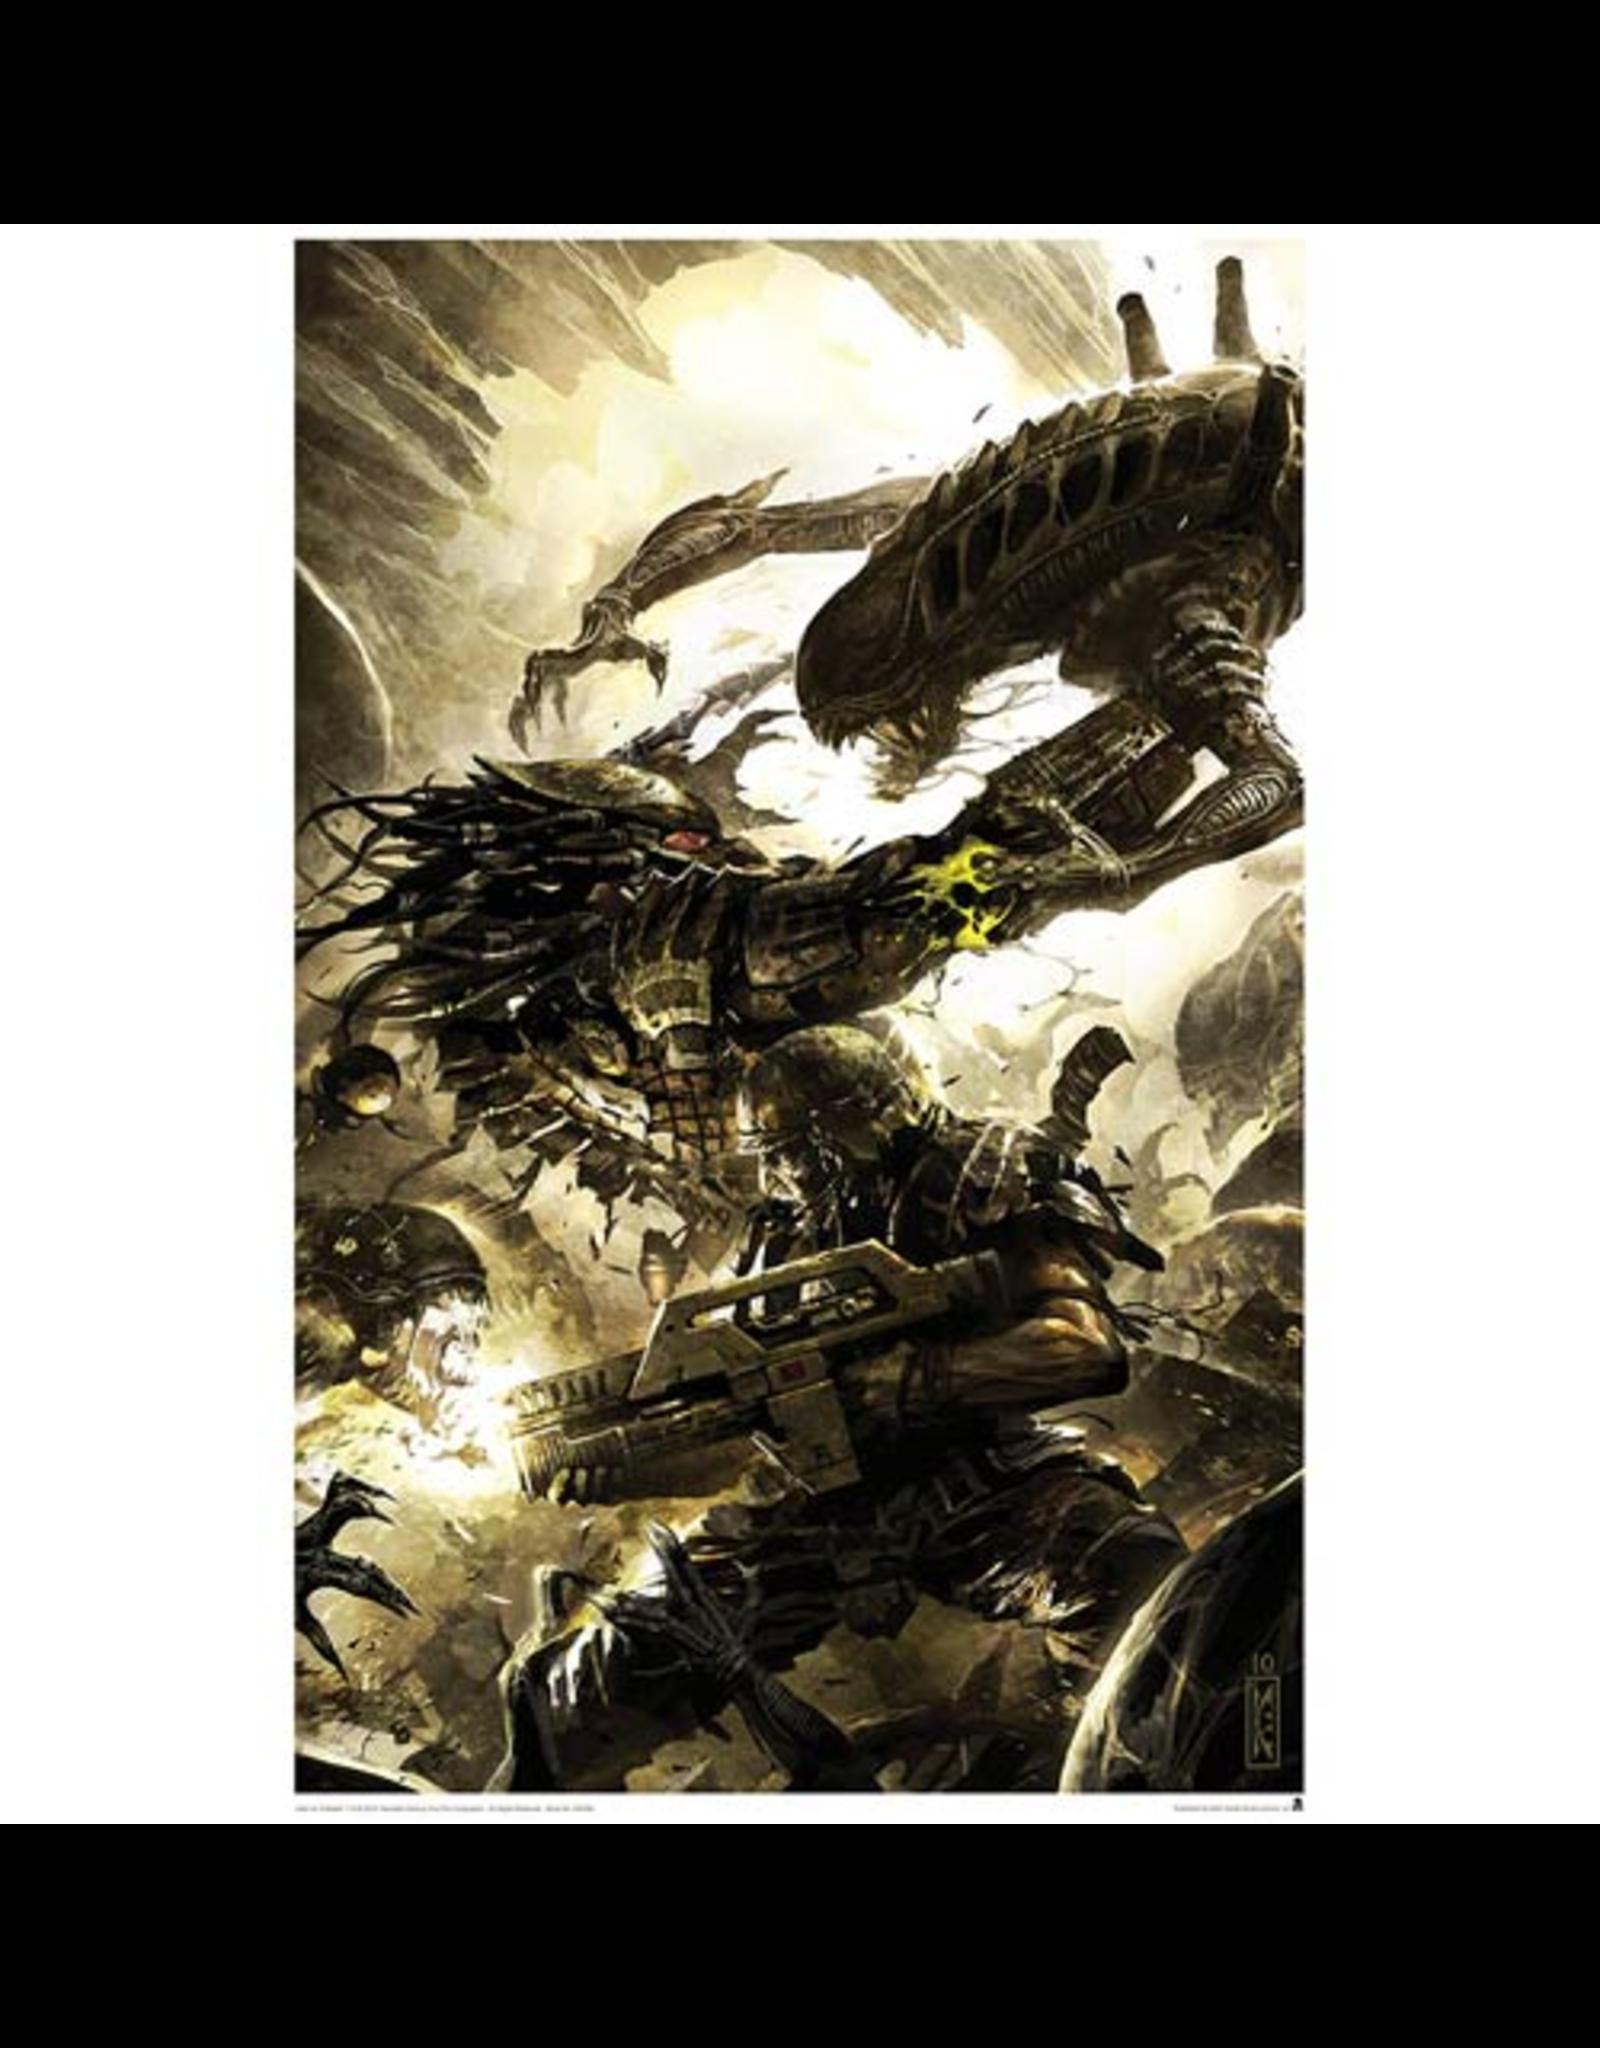 ACME Archives Alien vs. Predator Three World War #4 Lithograph Print